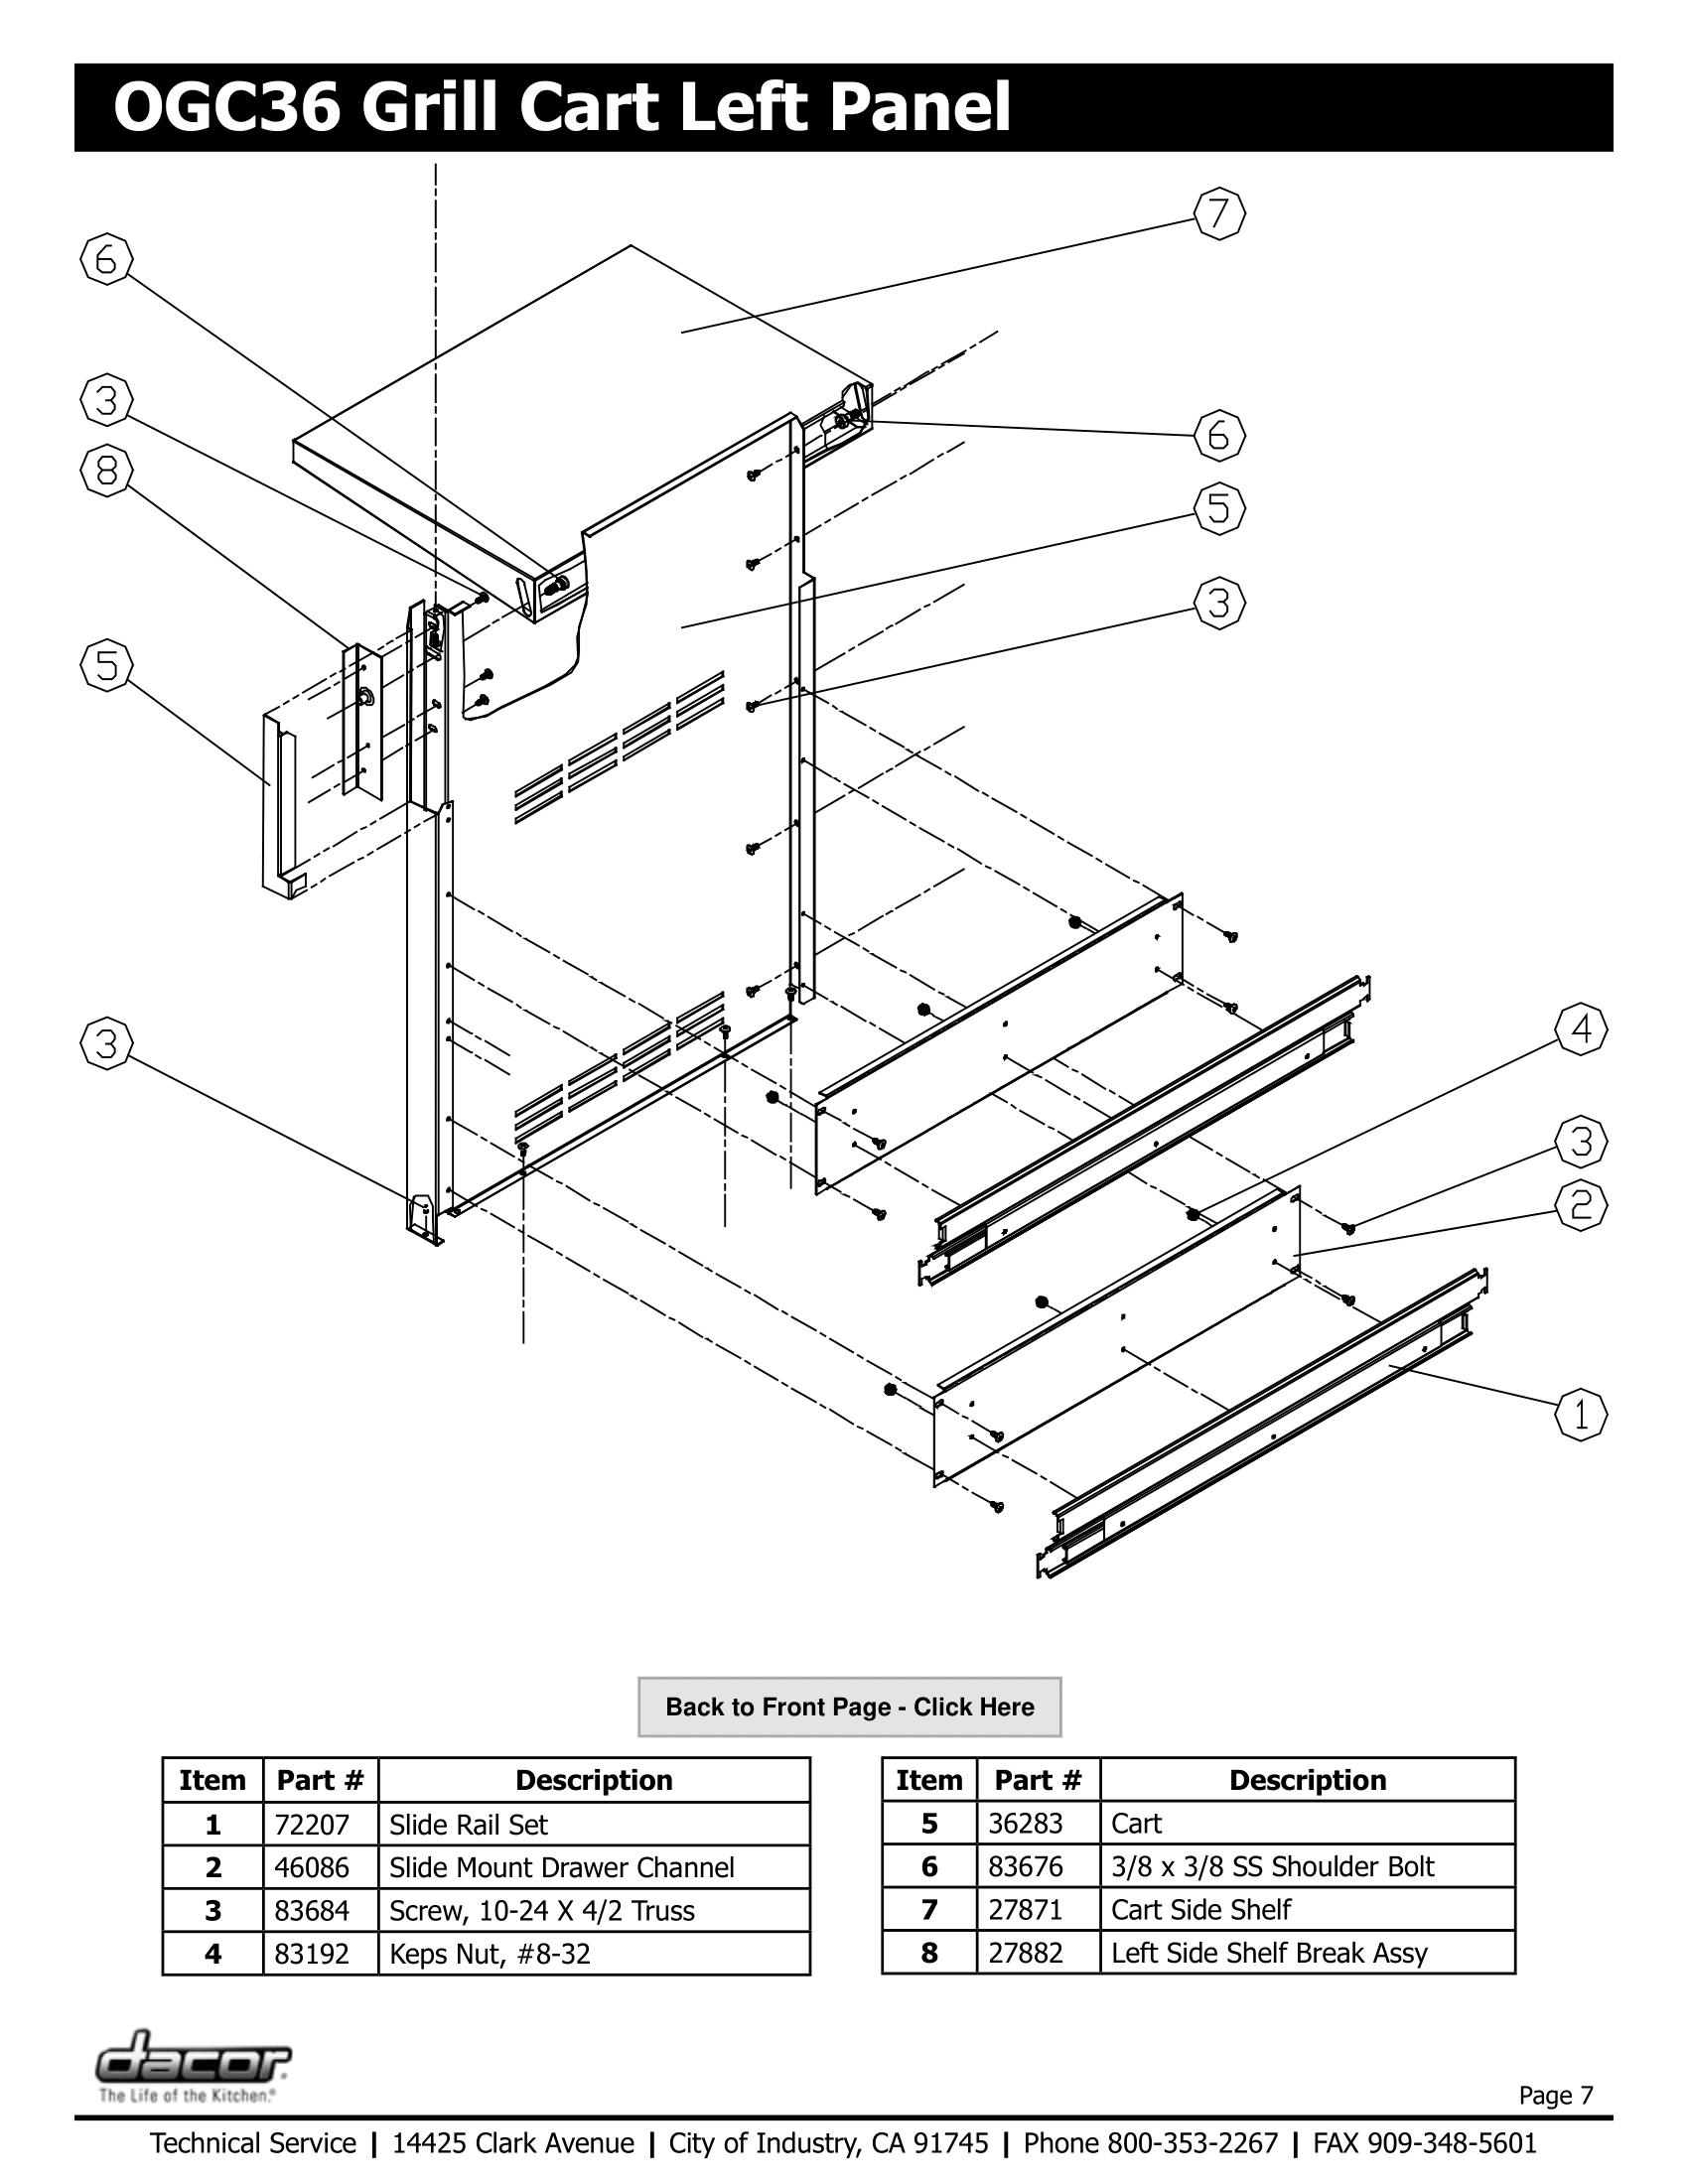 Dacor OGC36 Left Panel Schematic